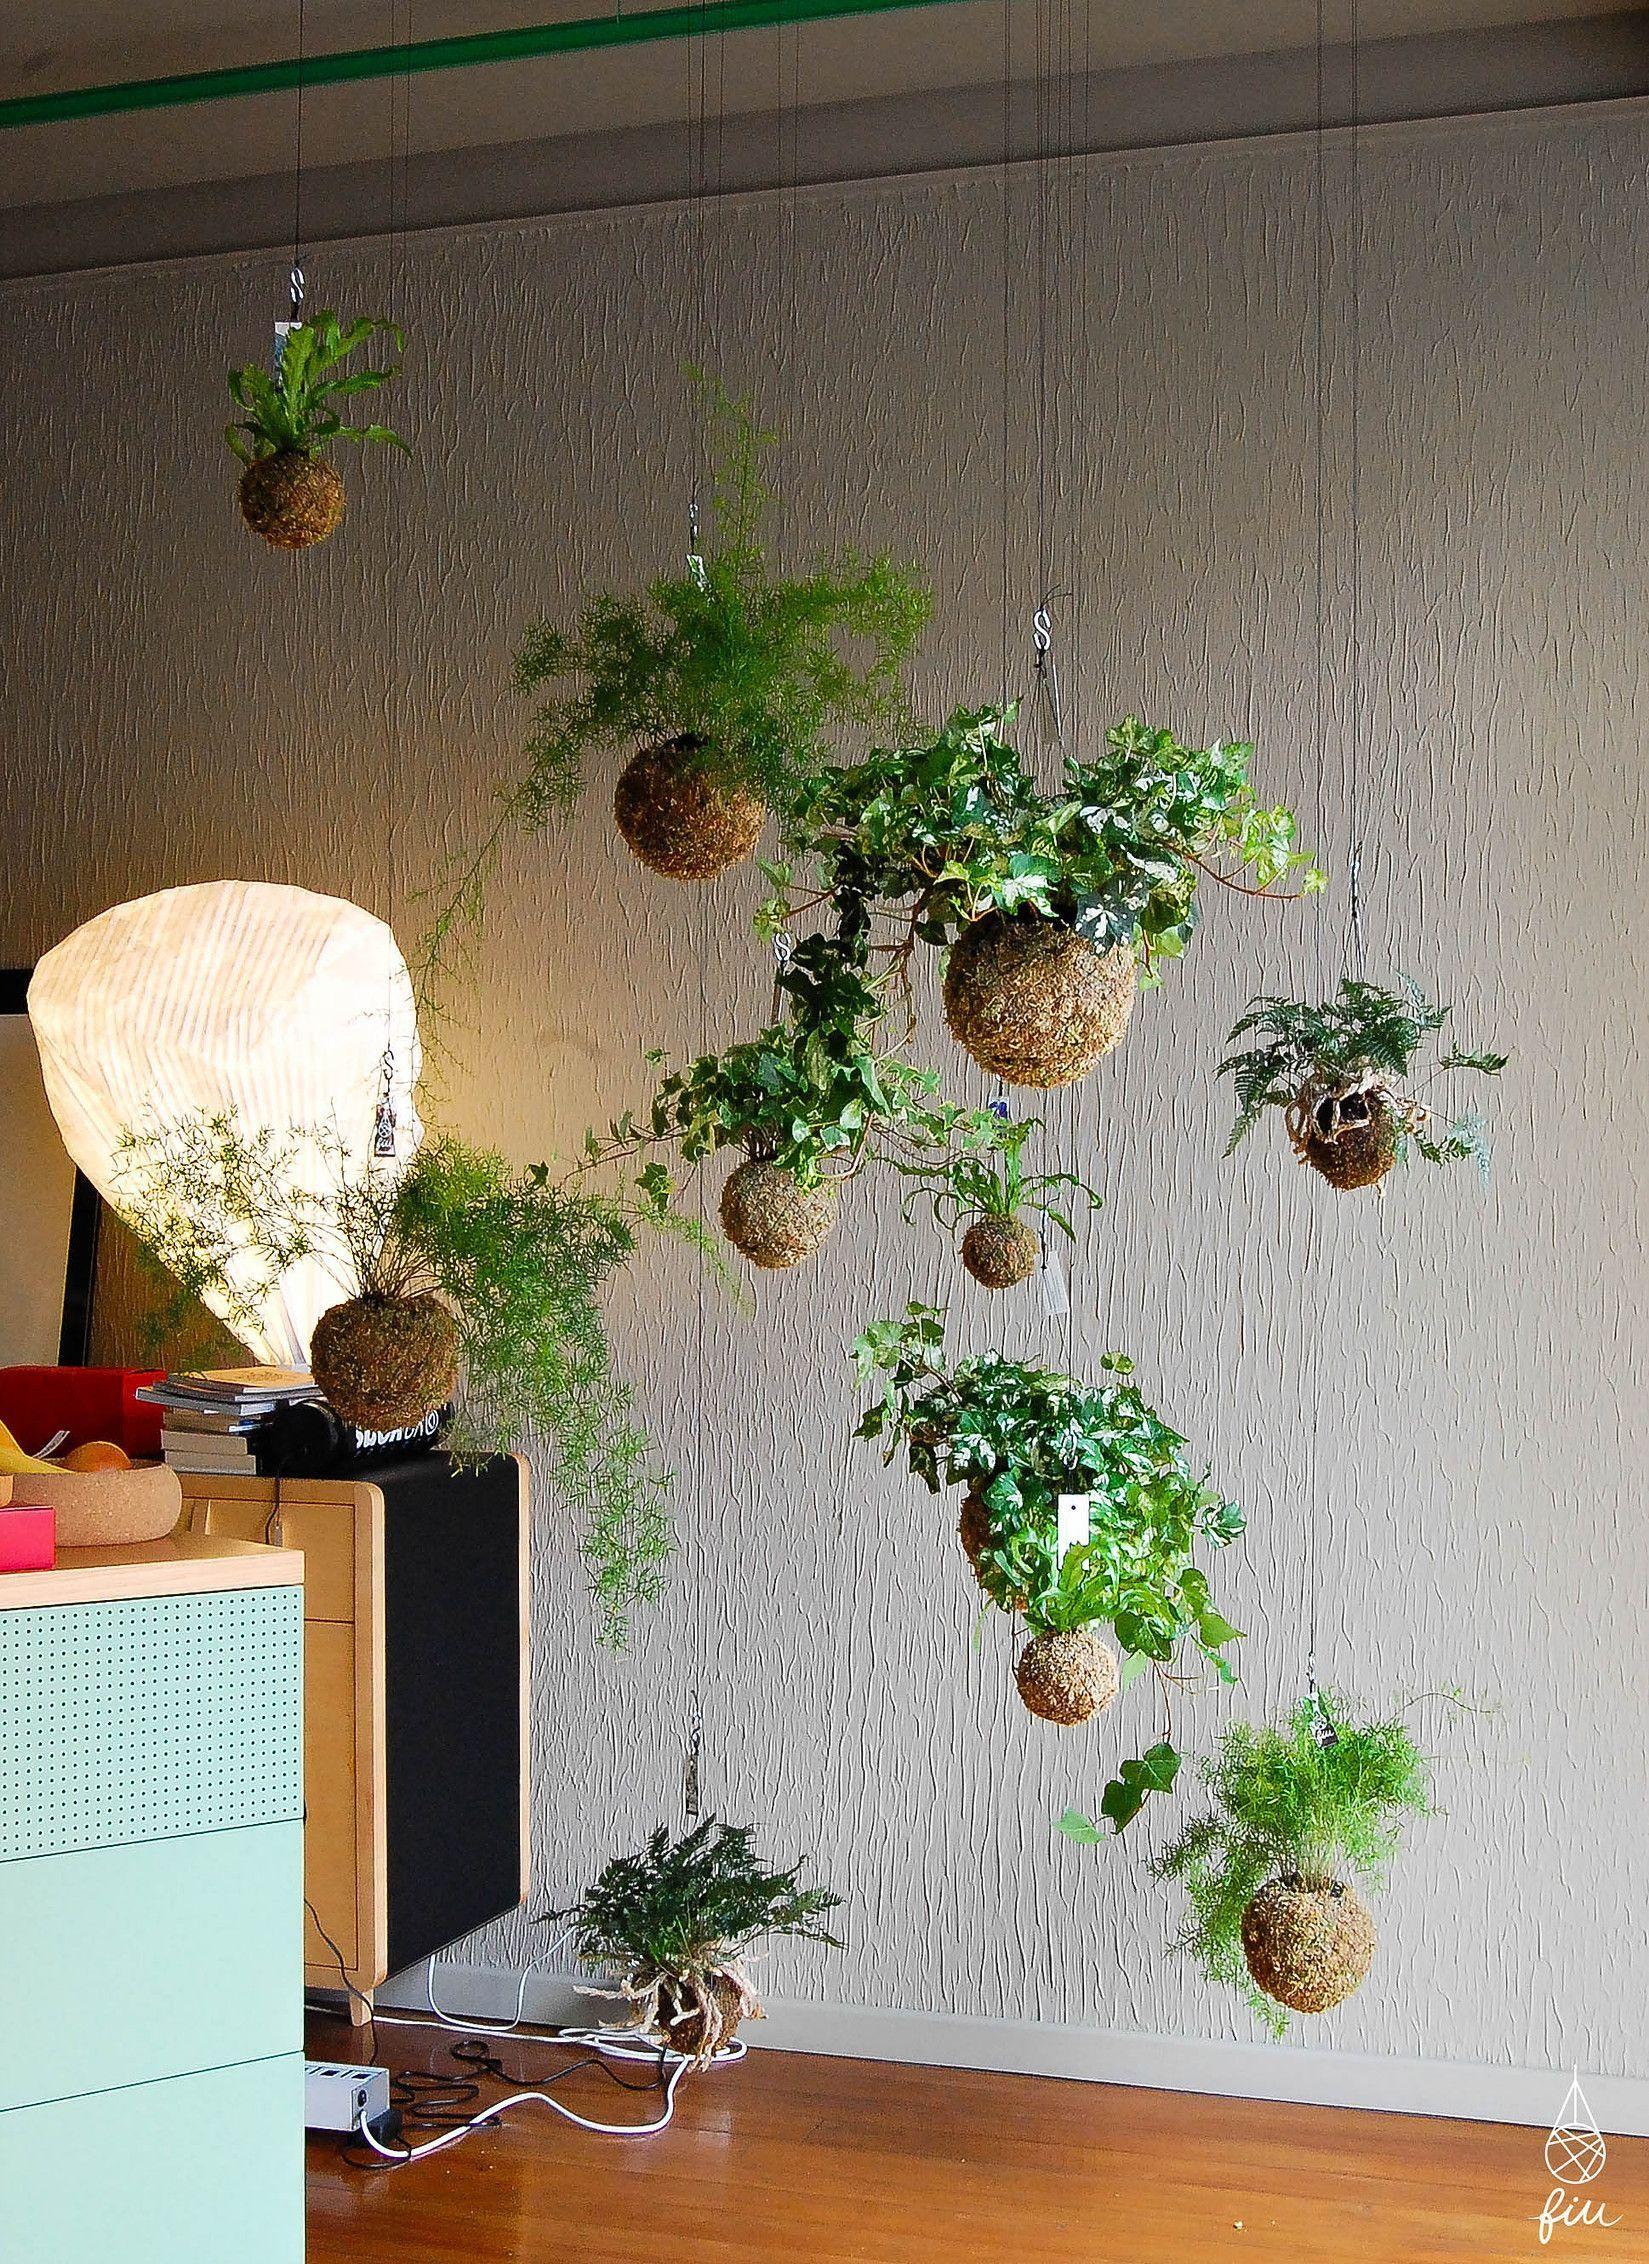 Best Useful Ideas Artificial Grass Porch Artificial Flowers Wedding Artificial Plants Outdoor Artificial Plants Indoor Hanging Plants Small Artificial Plants